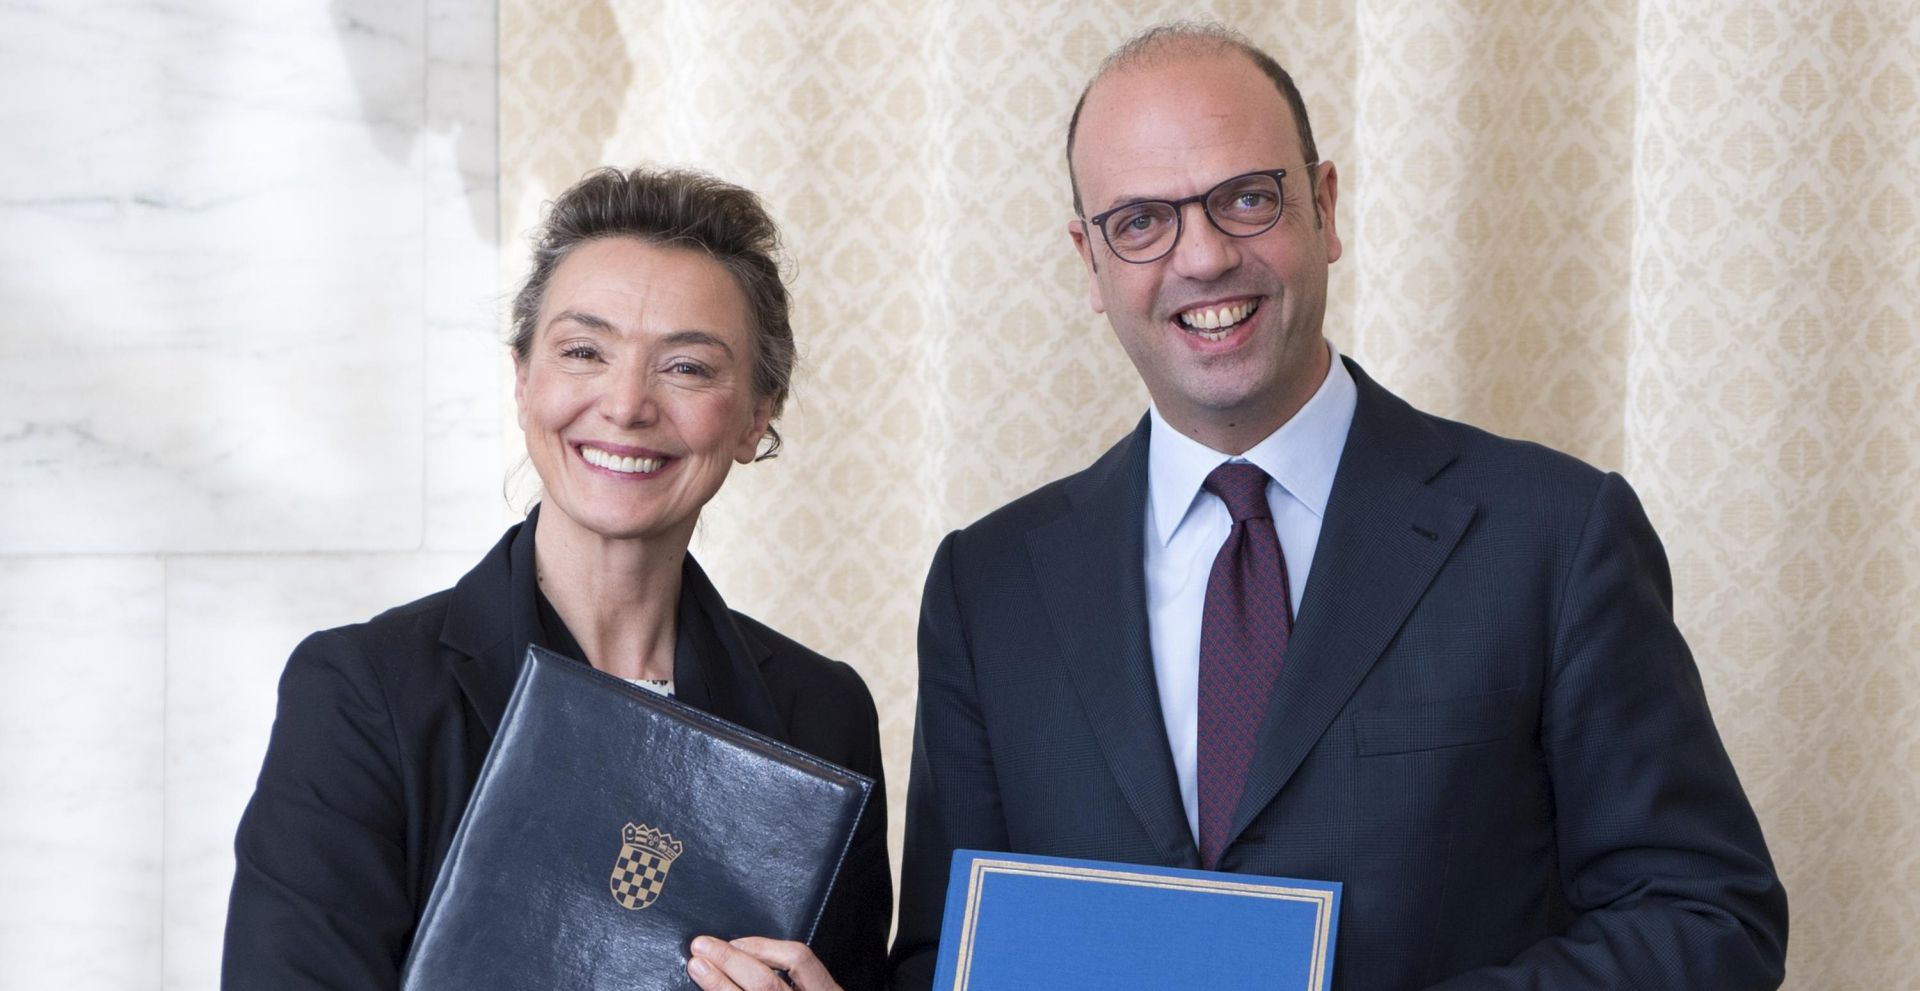 Italija podupire ulazak RH i u Schengen i u OECD